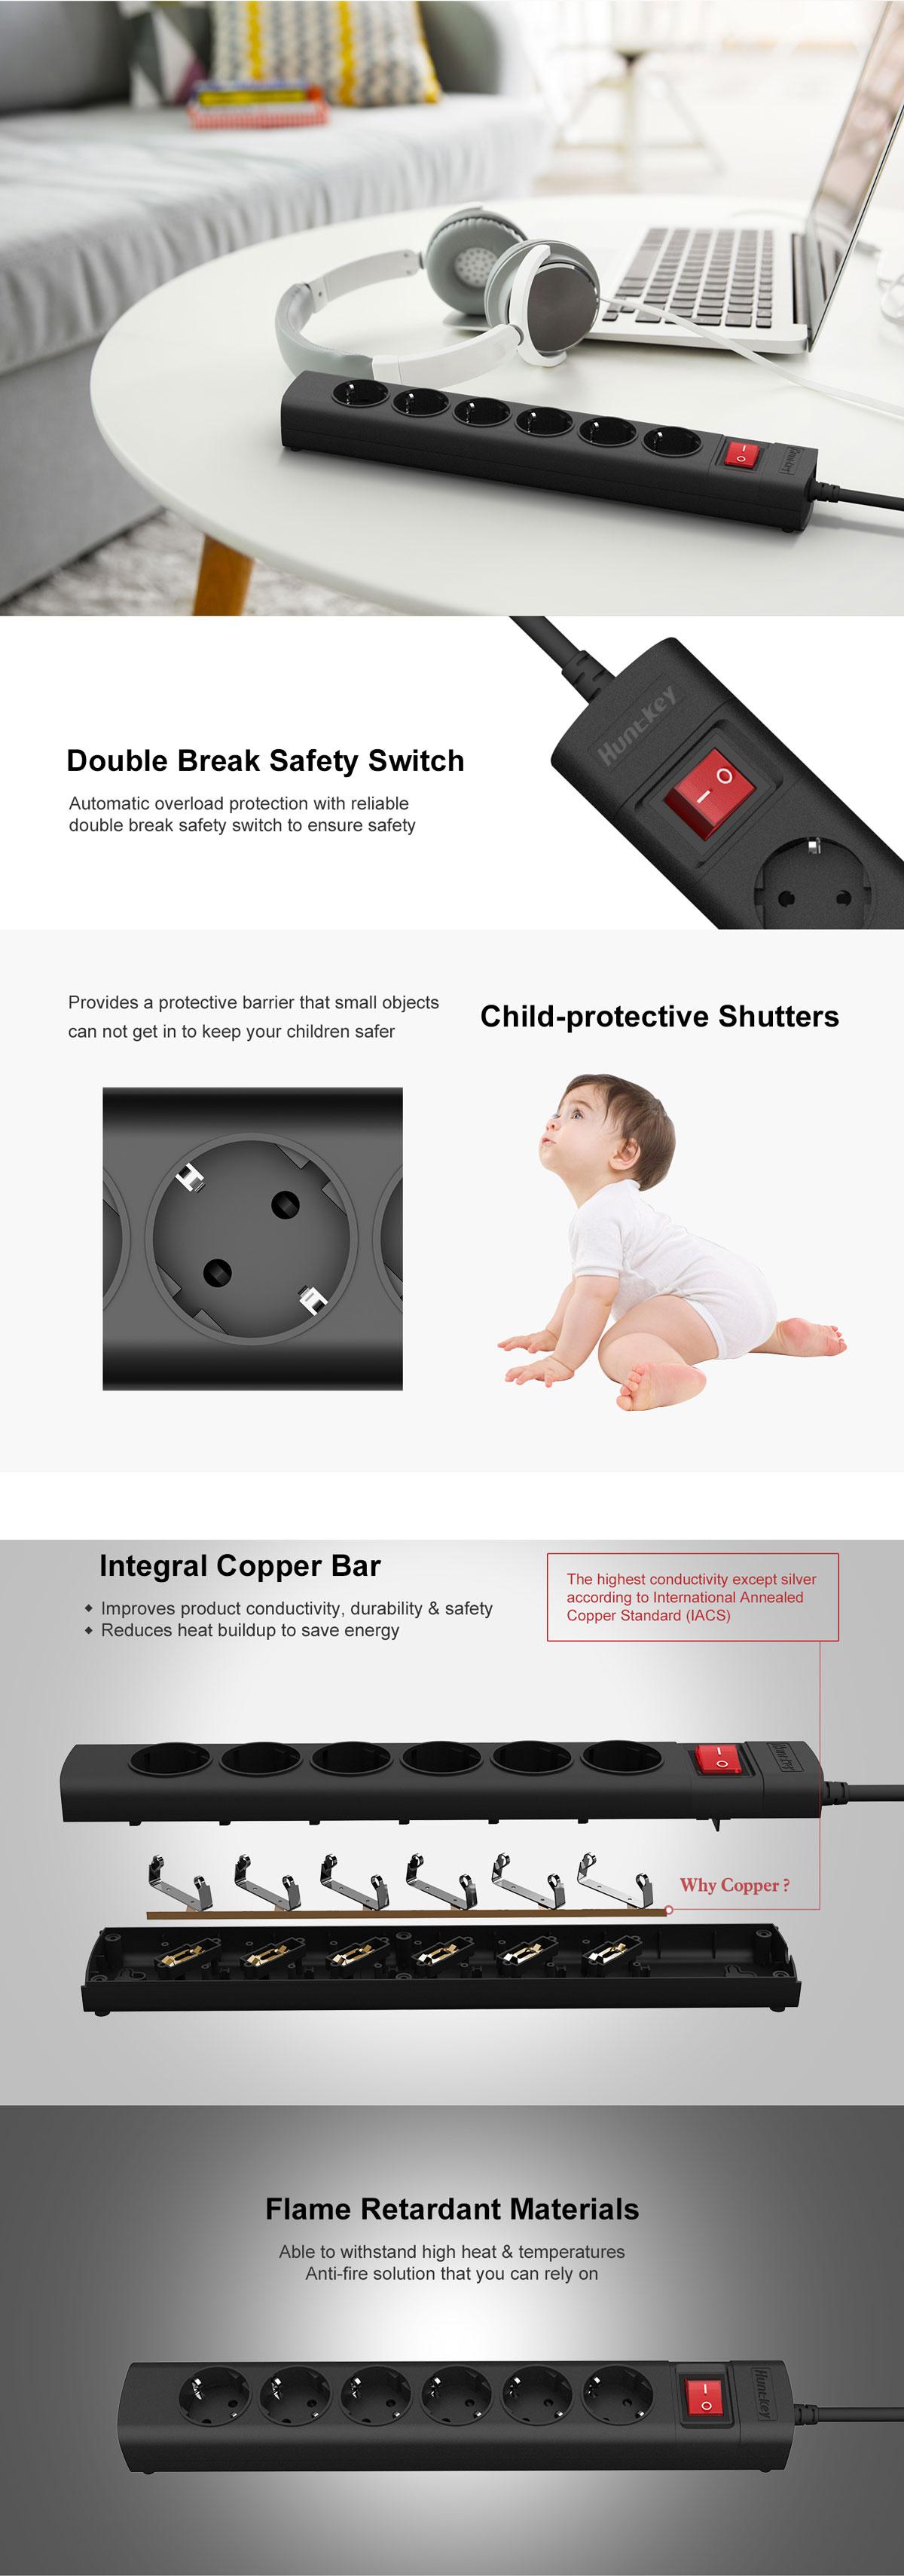 surge-protector-14 SGA601